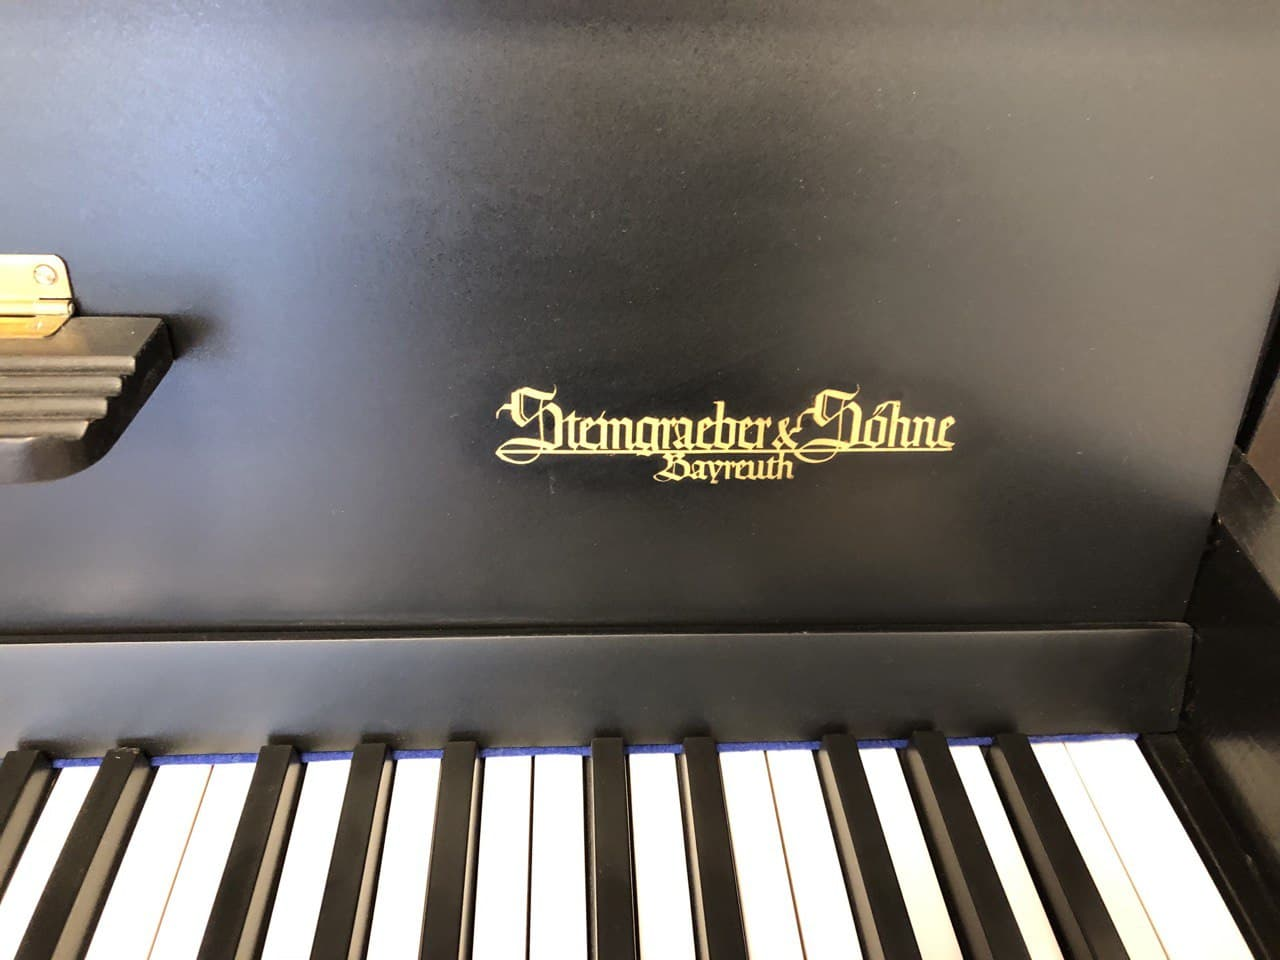 Steingräber2